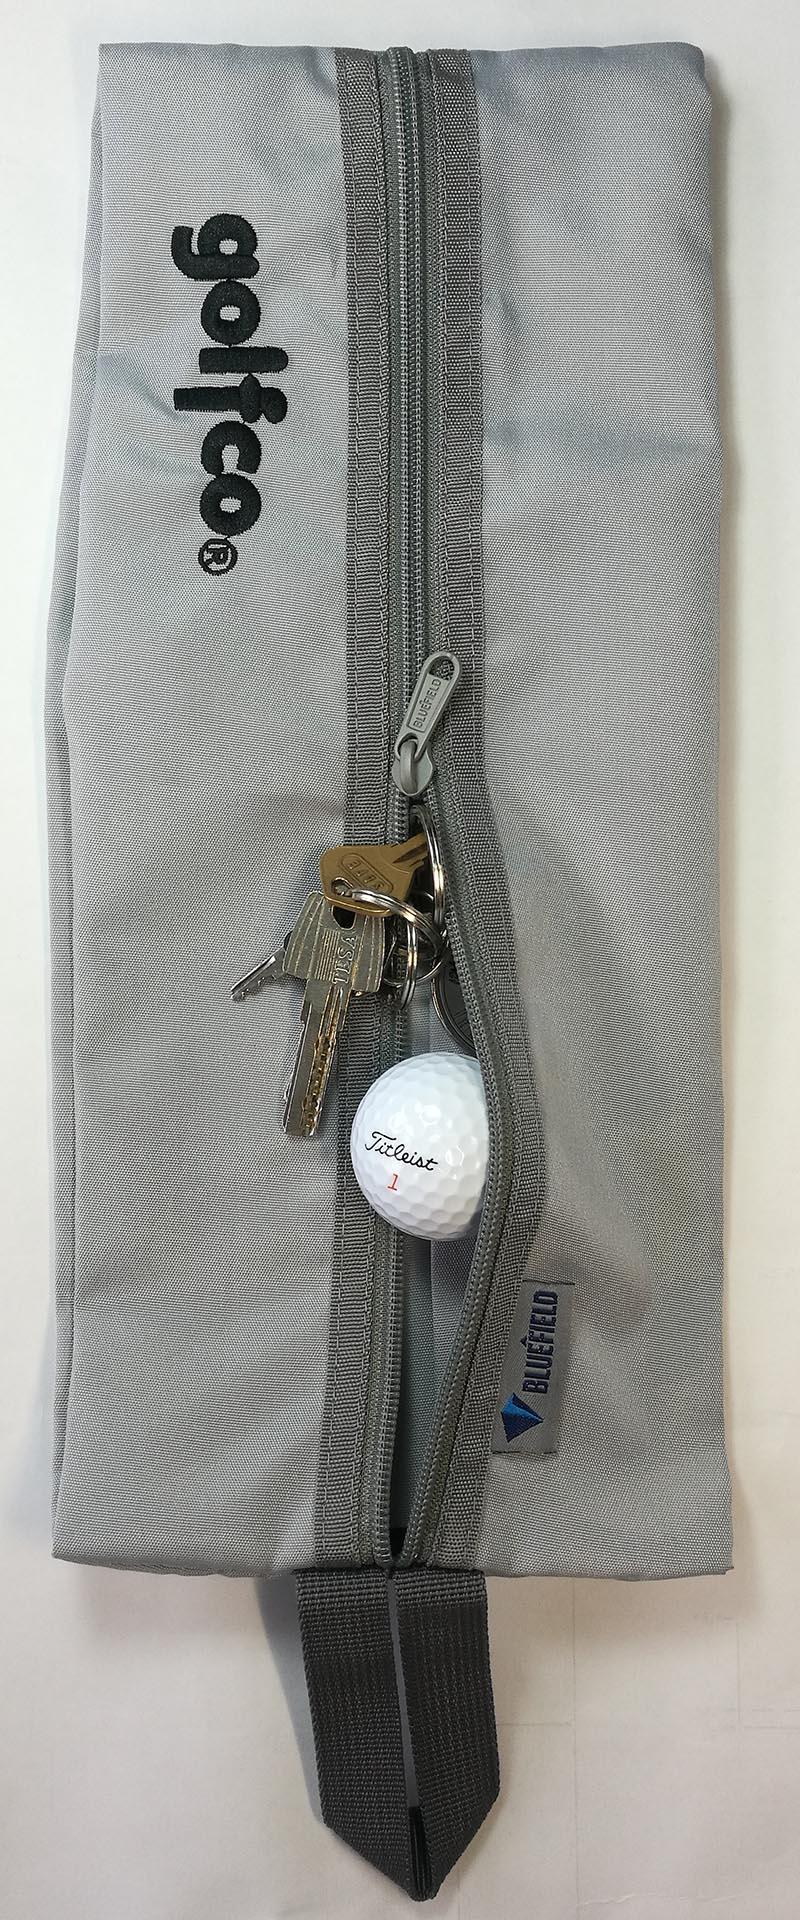 Estuche golfco bolsa organizador gris 01